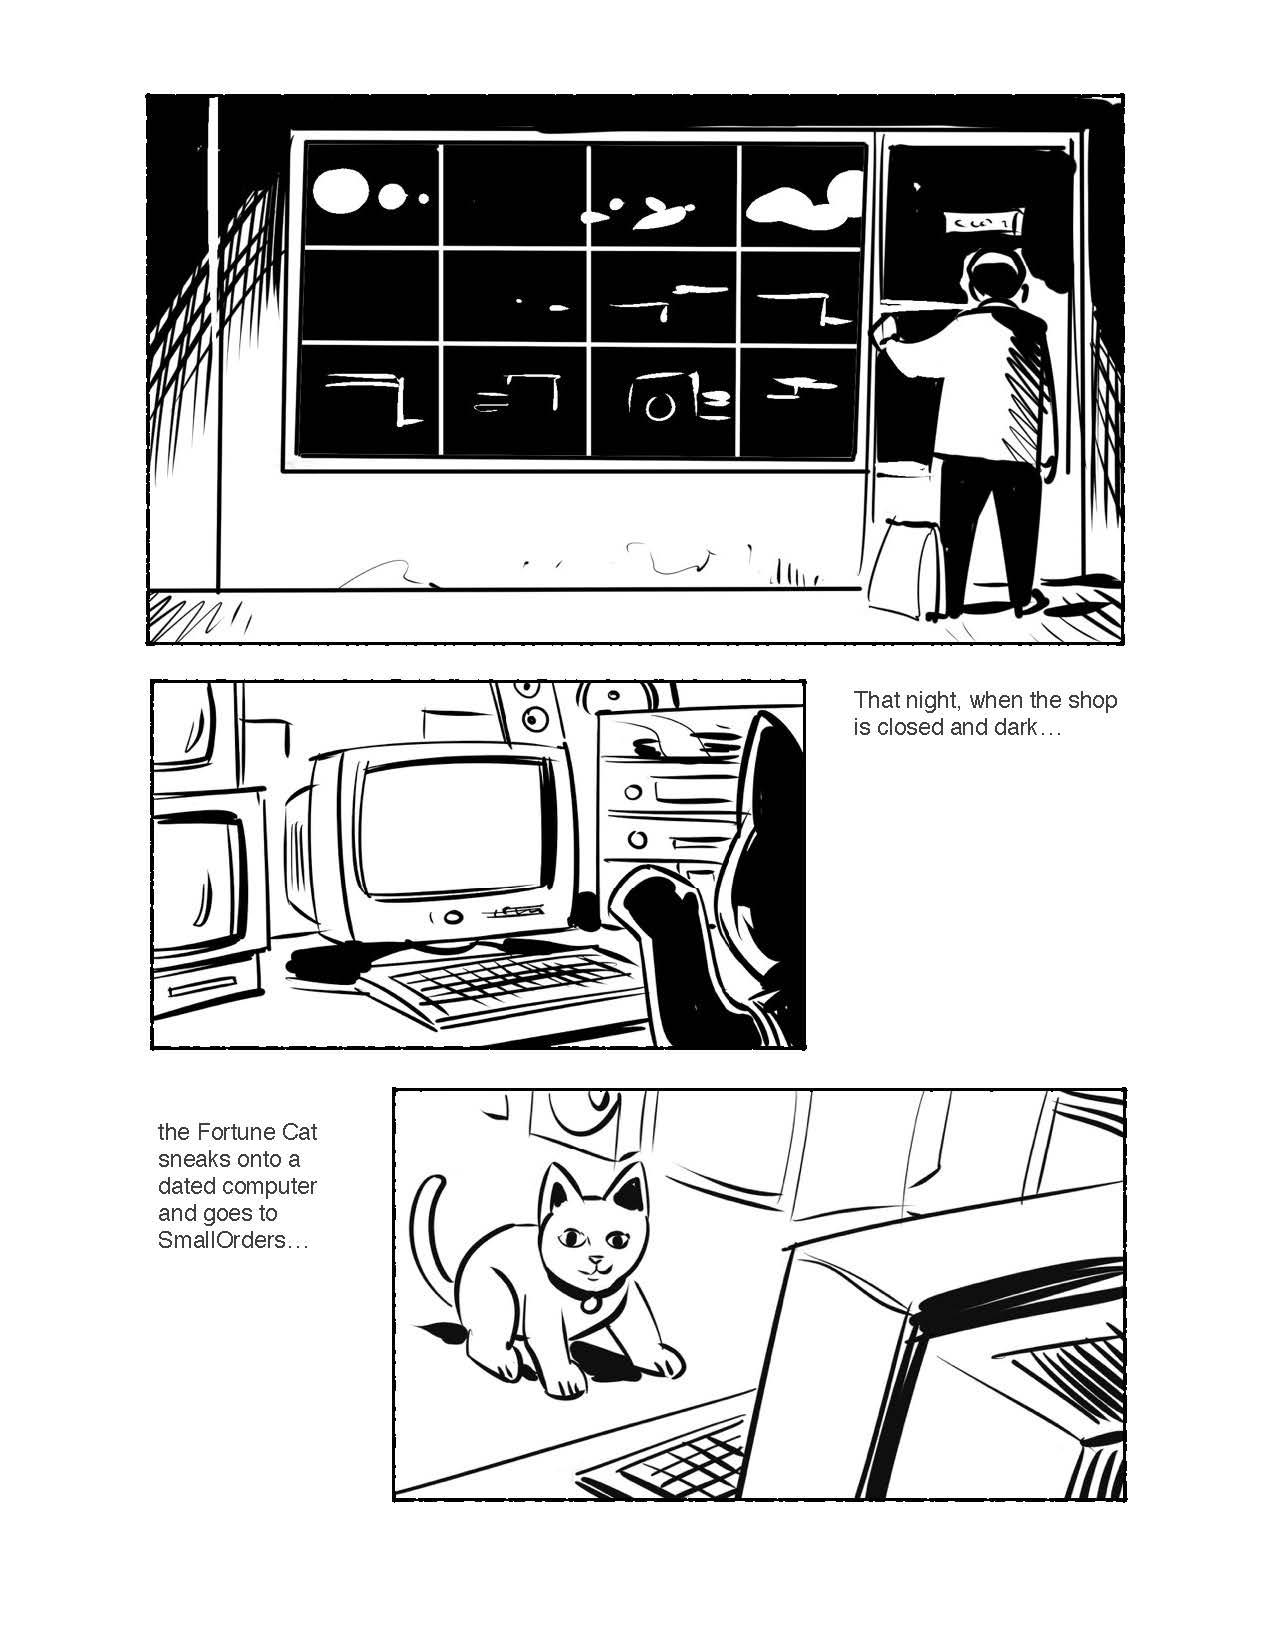 Storyboard HKTDC_Page_04.jpg